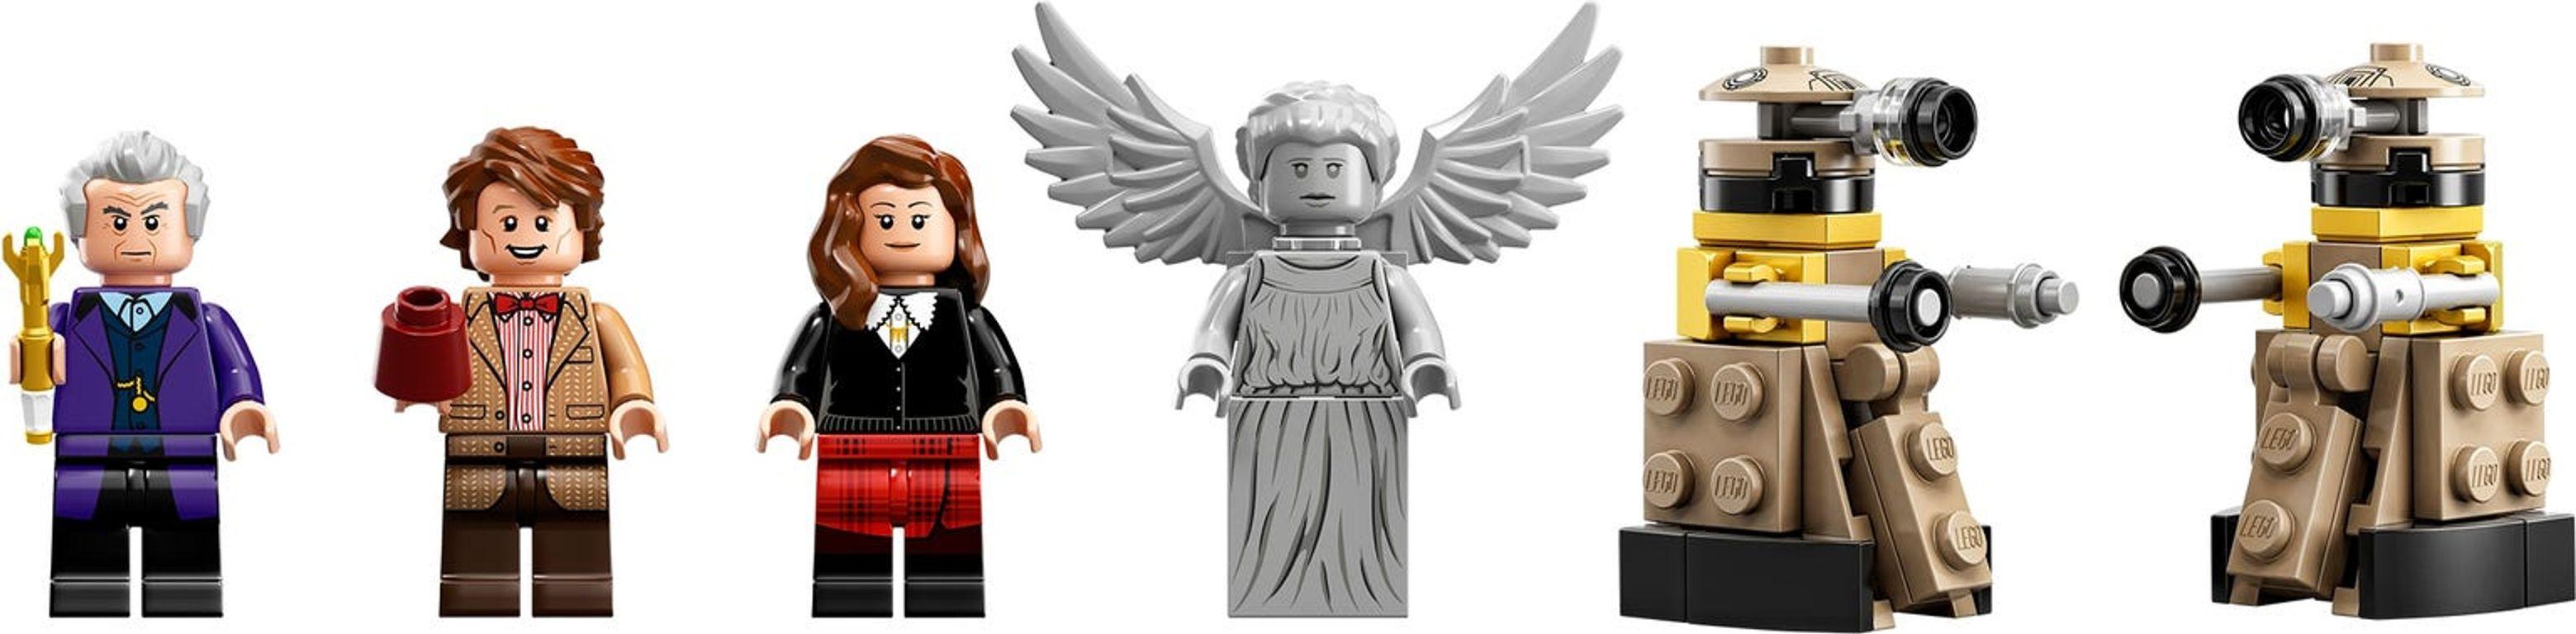 Doctor Who minifigures